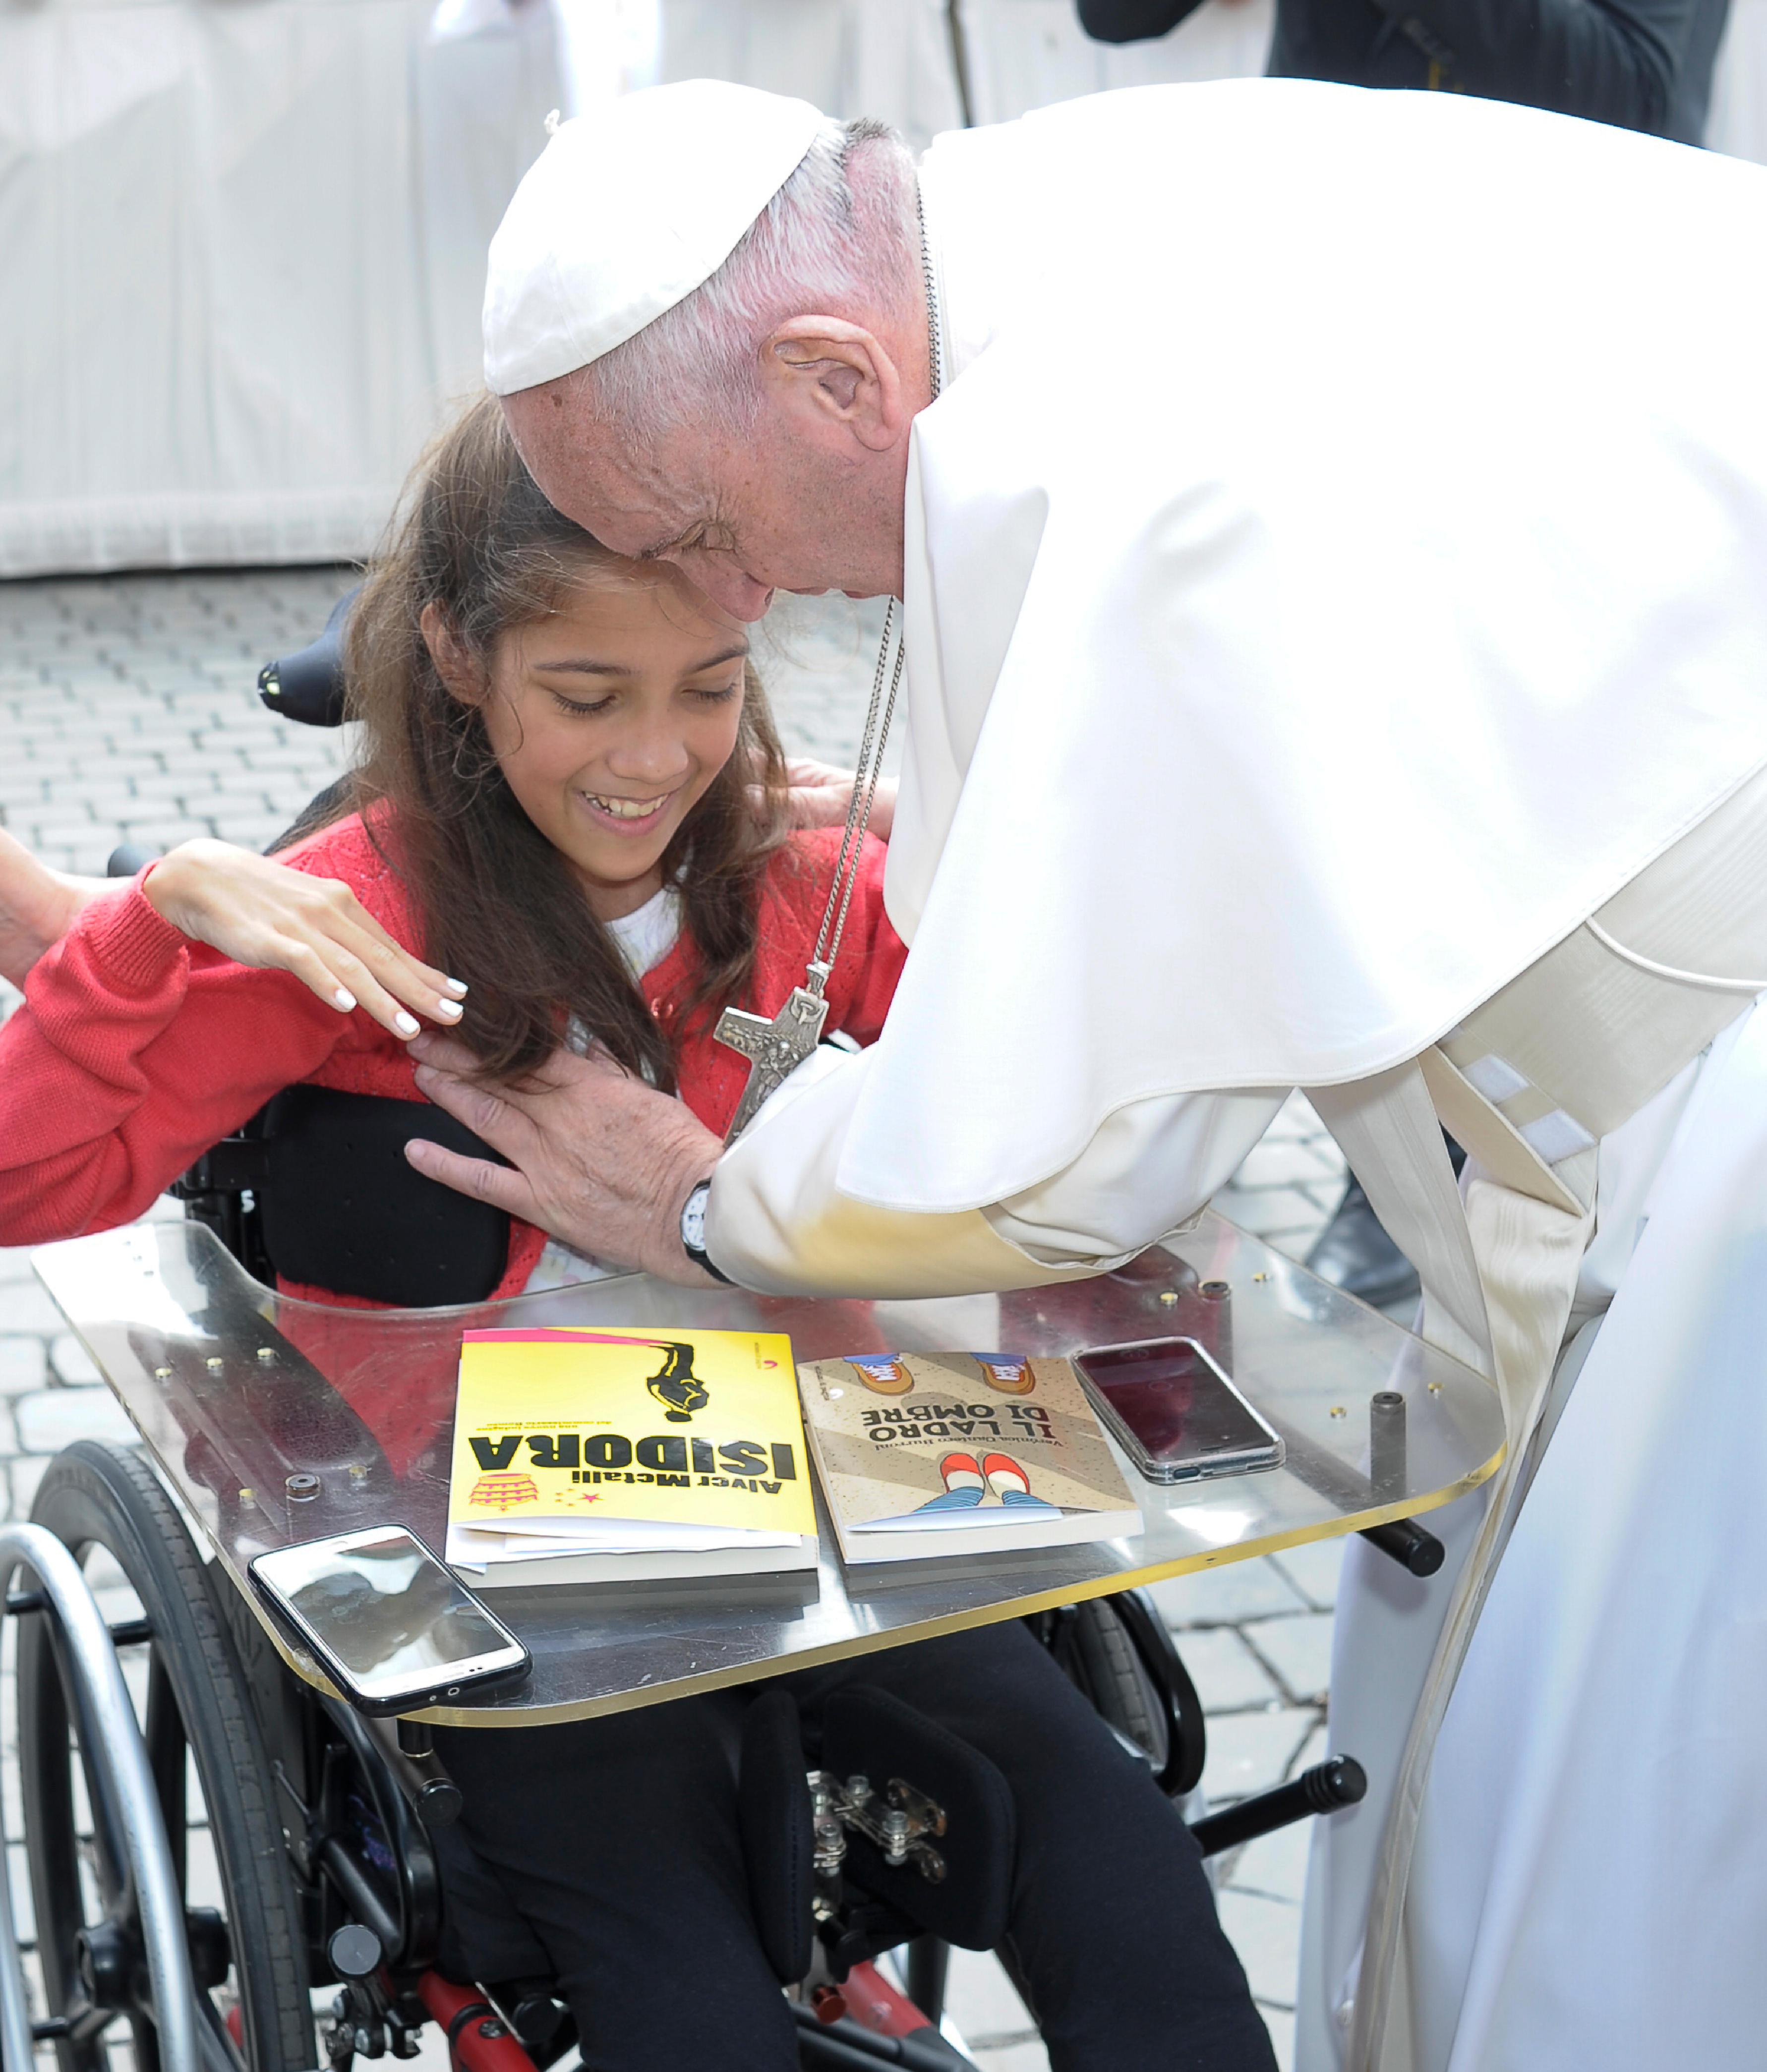 Veronica Cantero Burroni et le pape François, 1er juin 2016, L'Osservatore Romano